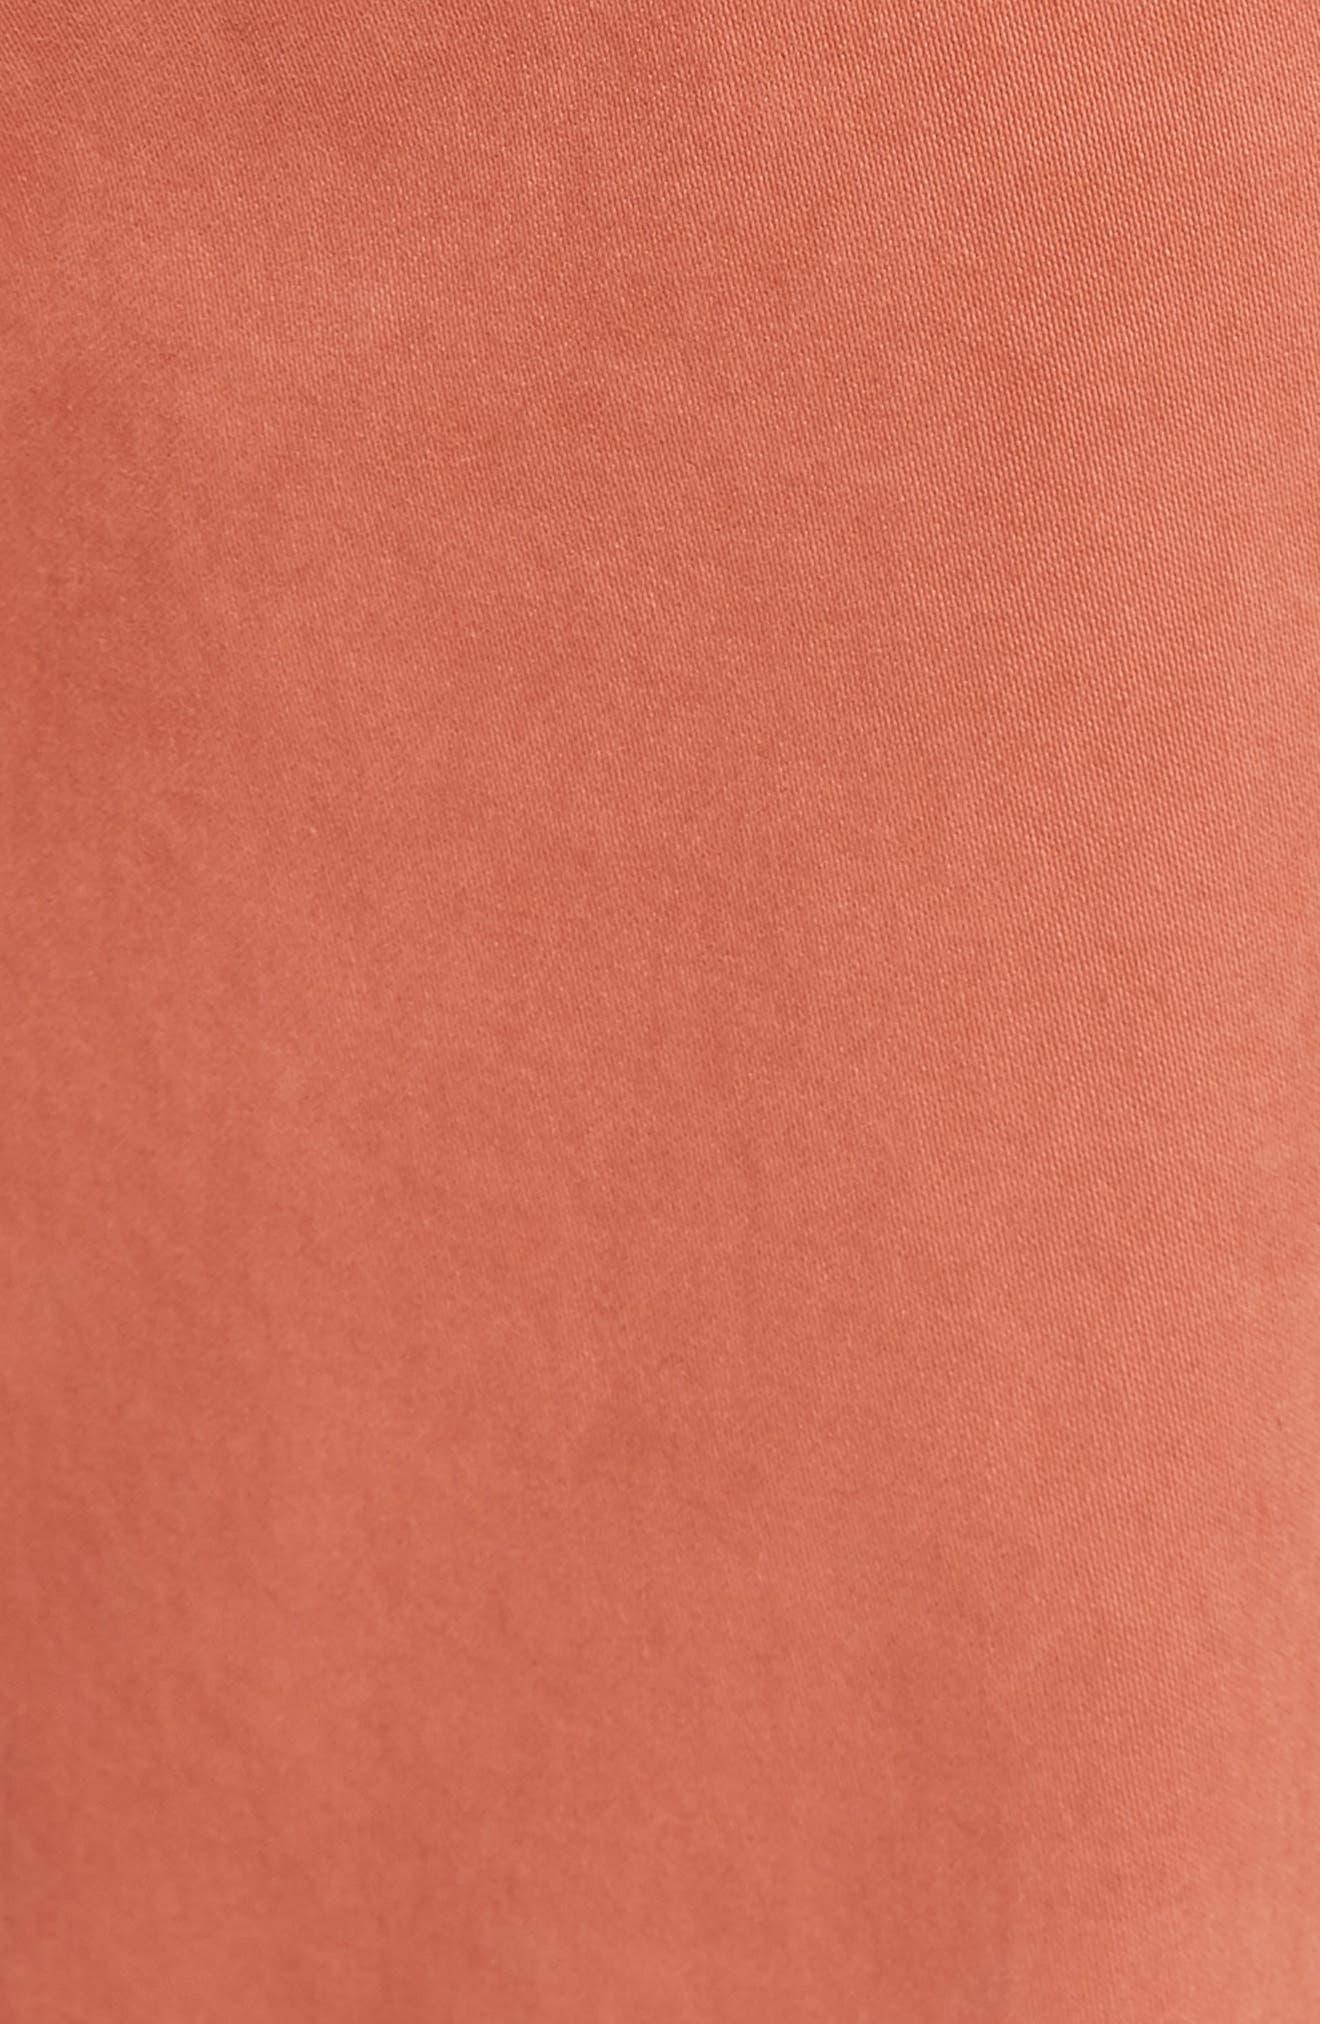 Graduate SUD Slim Straight Leg Pants,                             Alternate thumbnail 5, color,                             Sulfur Rosso Red